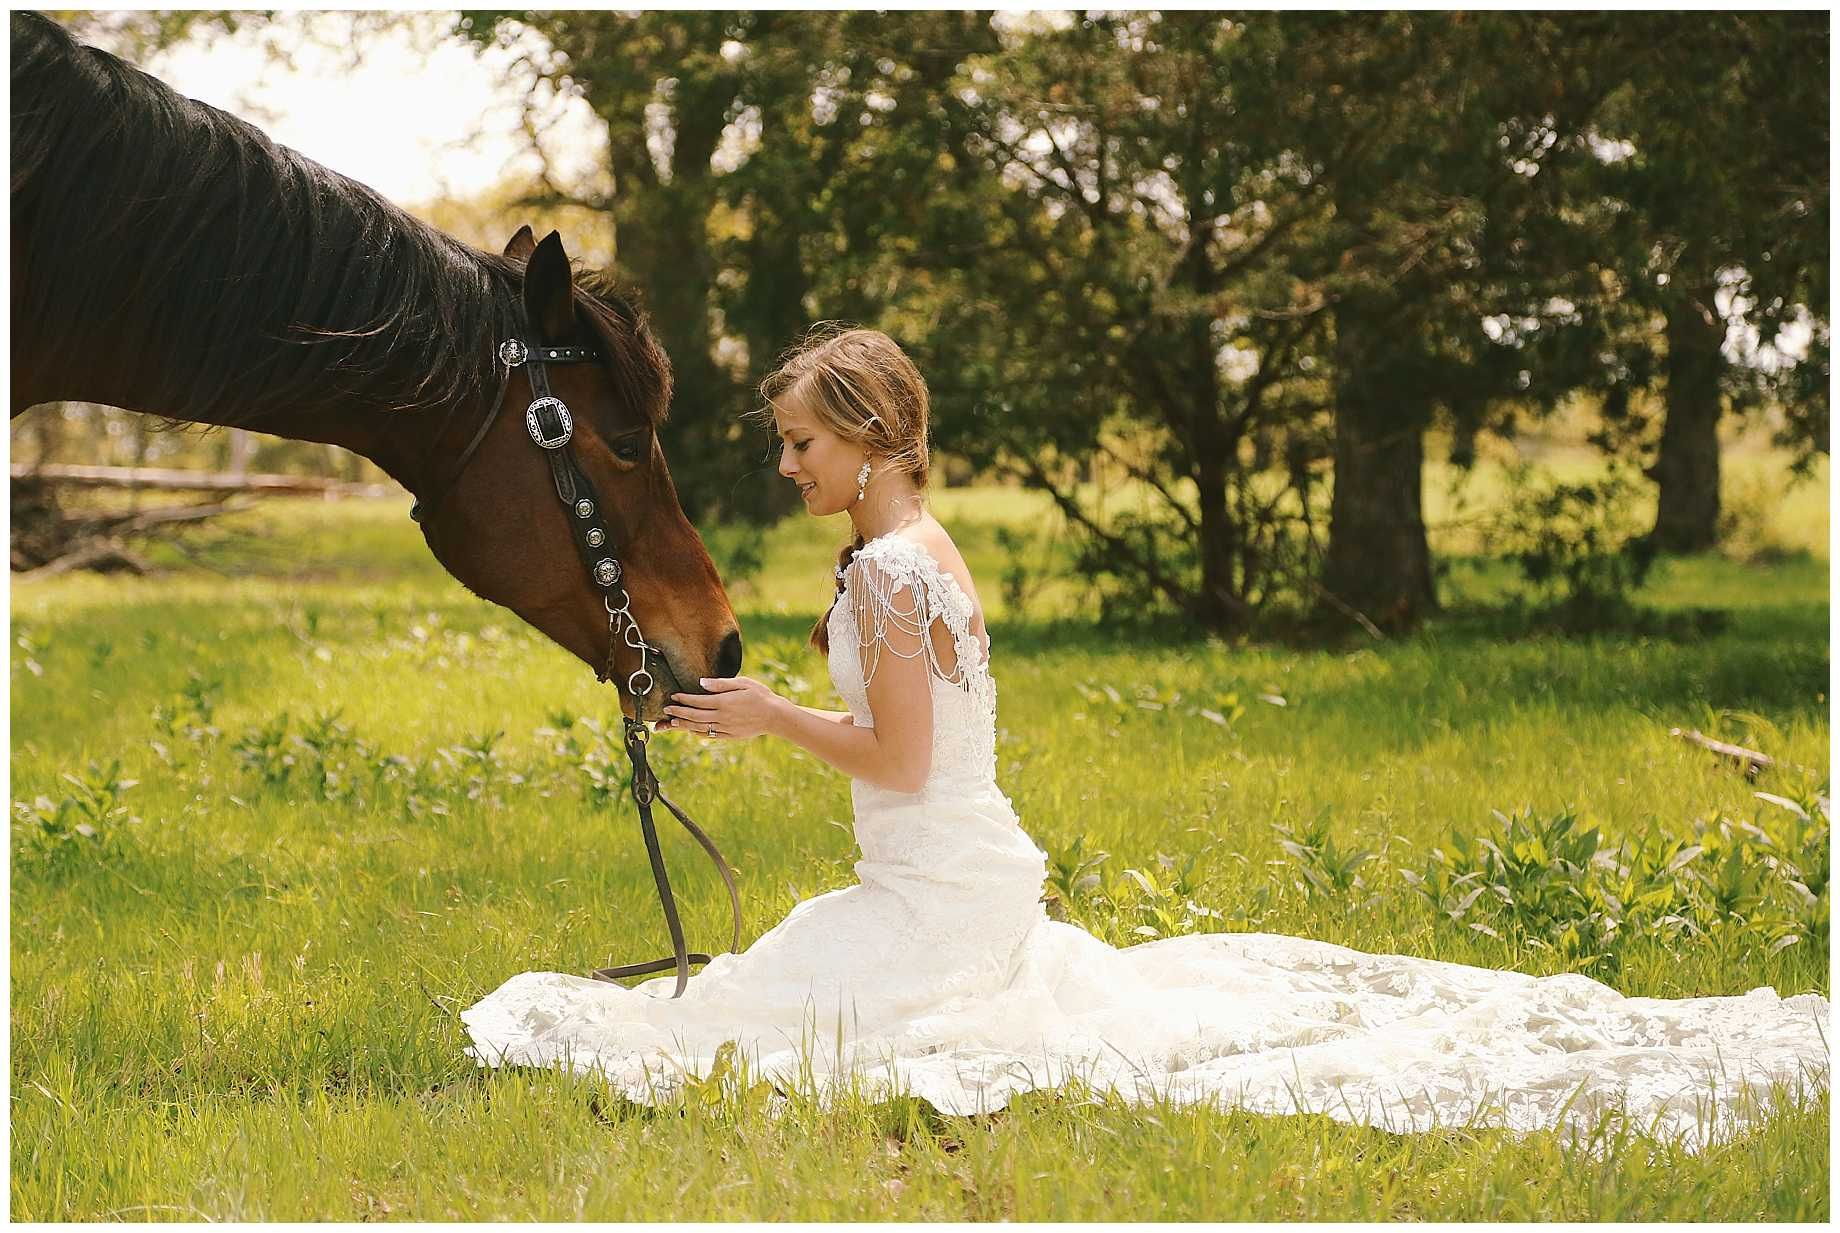 bride-on-a-horse-east-texas-08